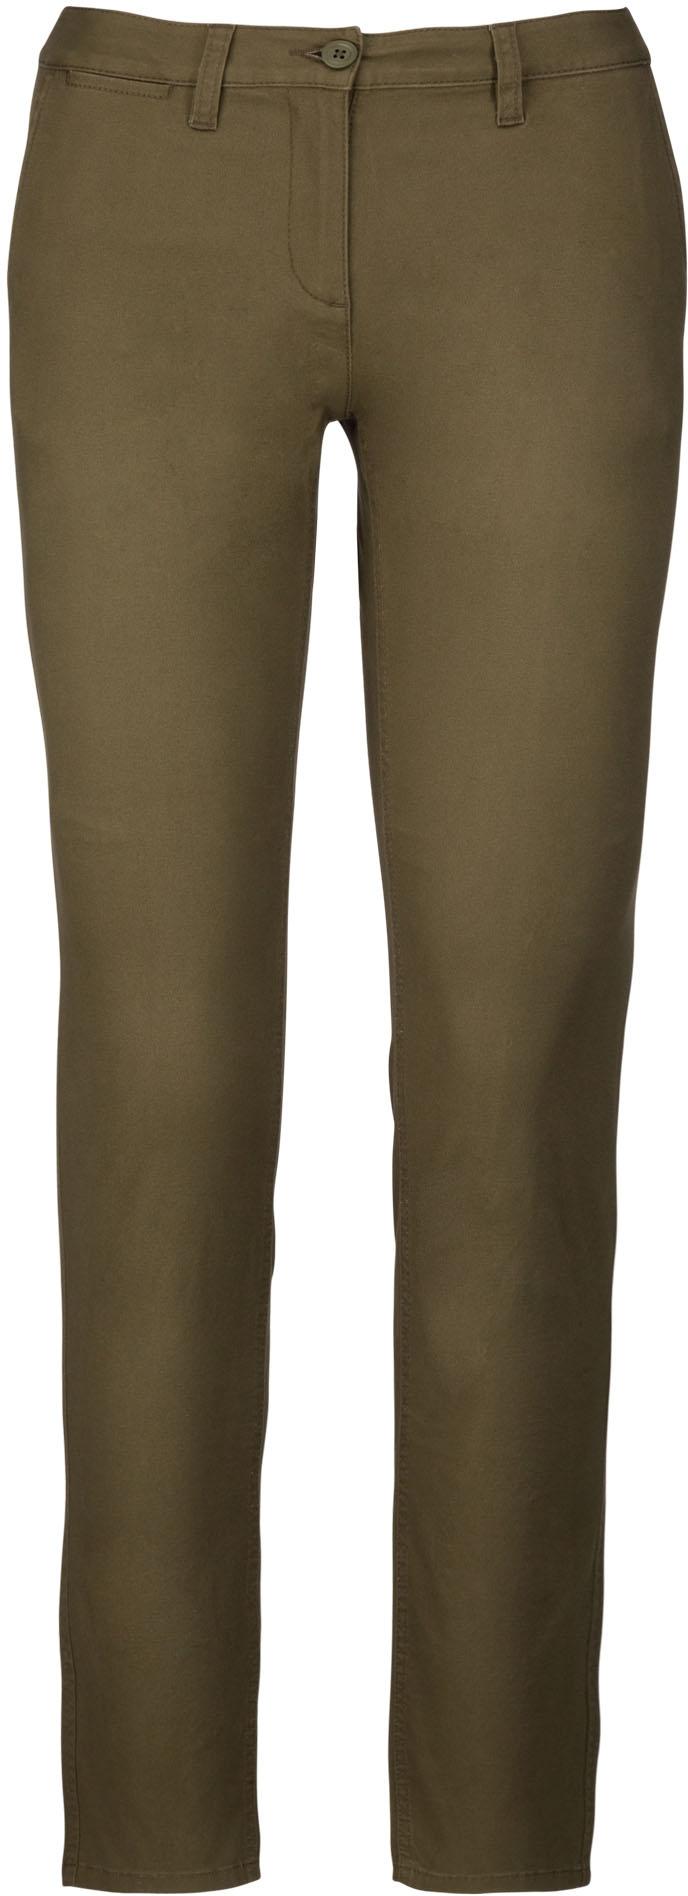 Pantalon chino femme - 2-1479-9